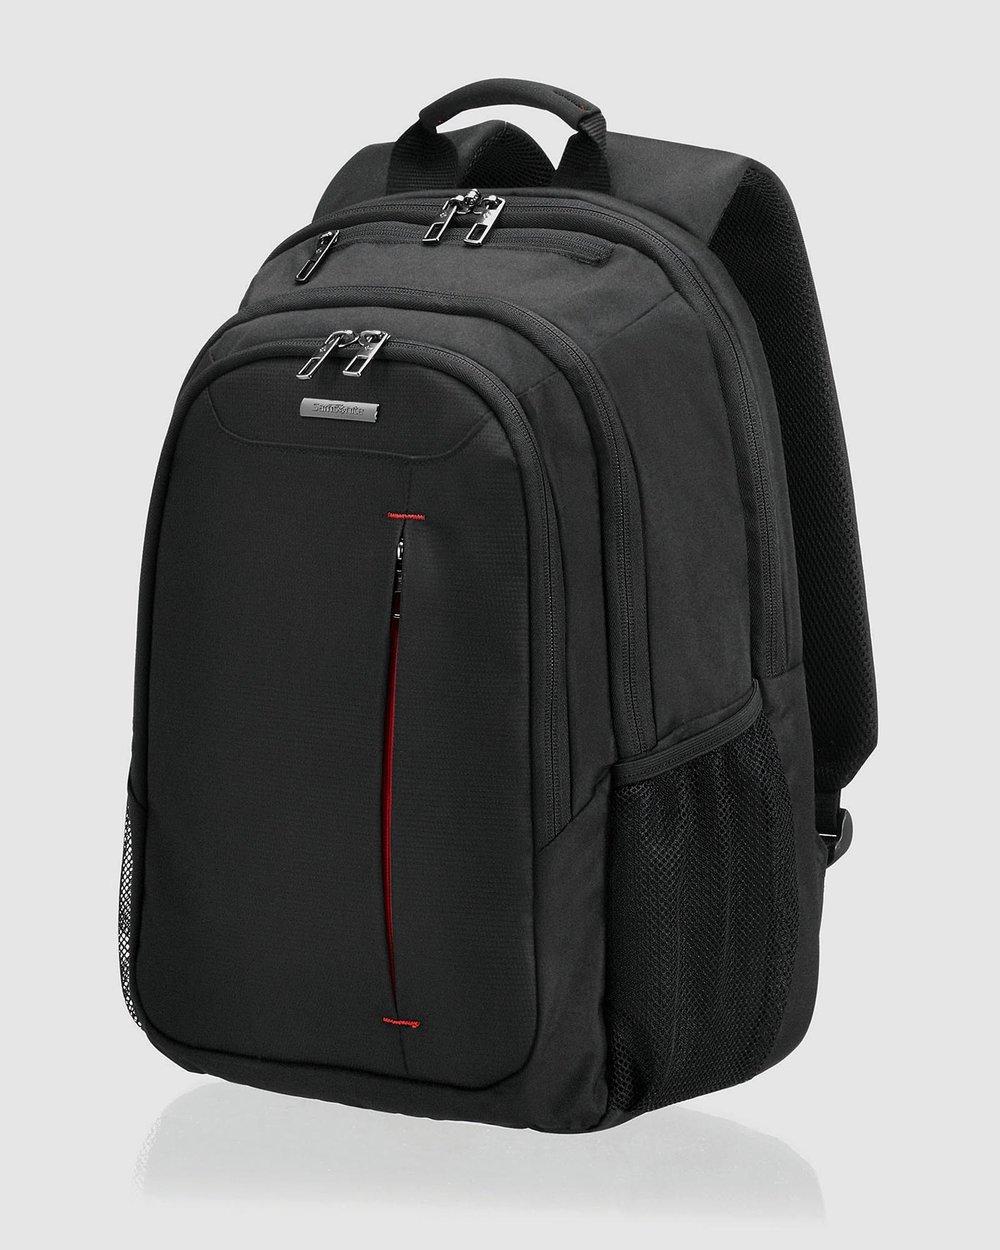 GuardIT Laptop Backpack by Samsonite Business Online  3fcae0c266dcf